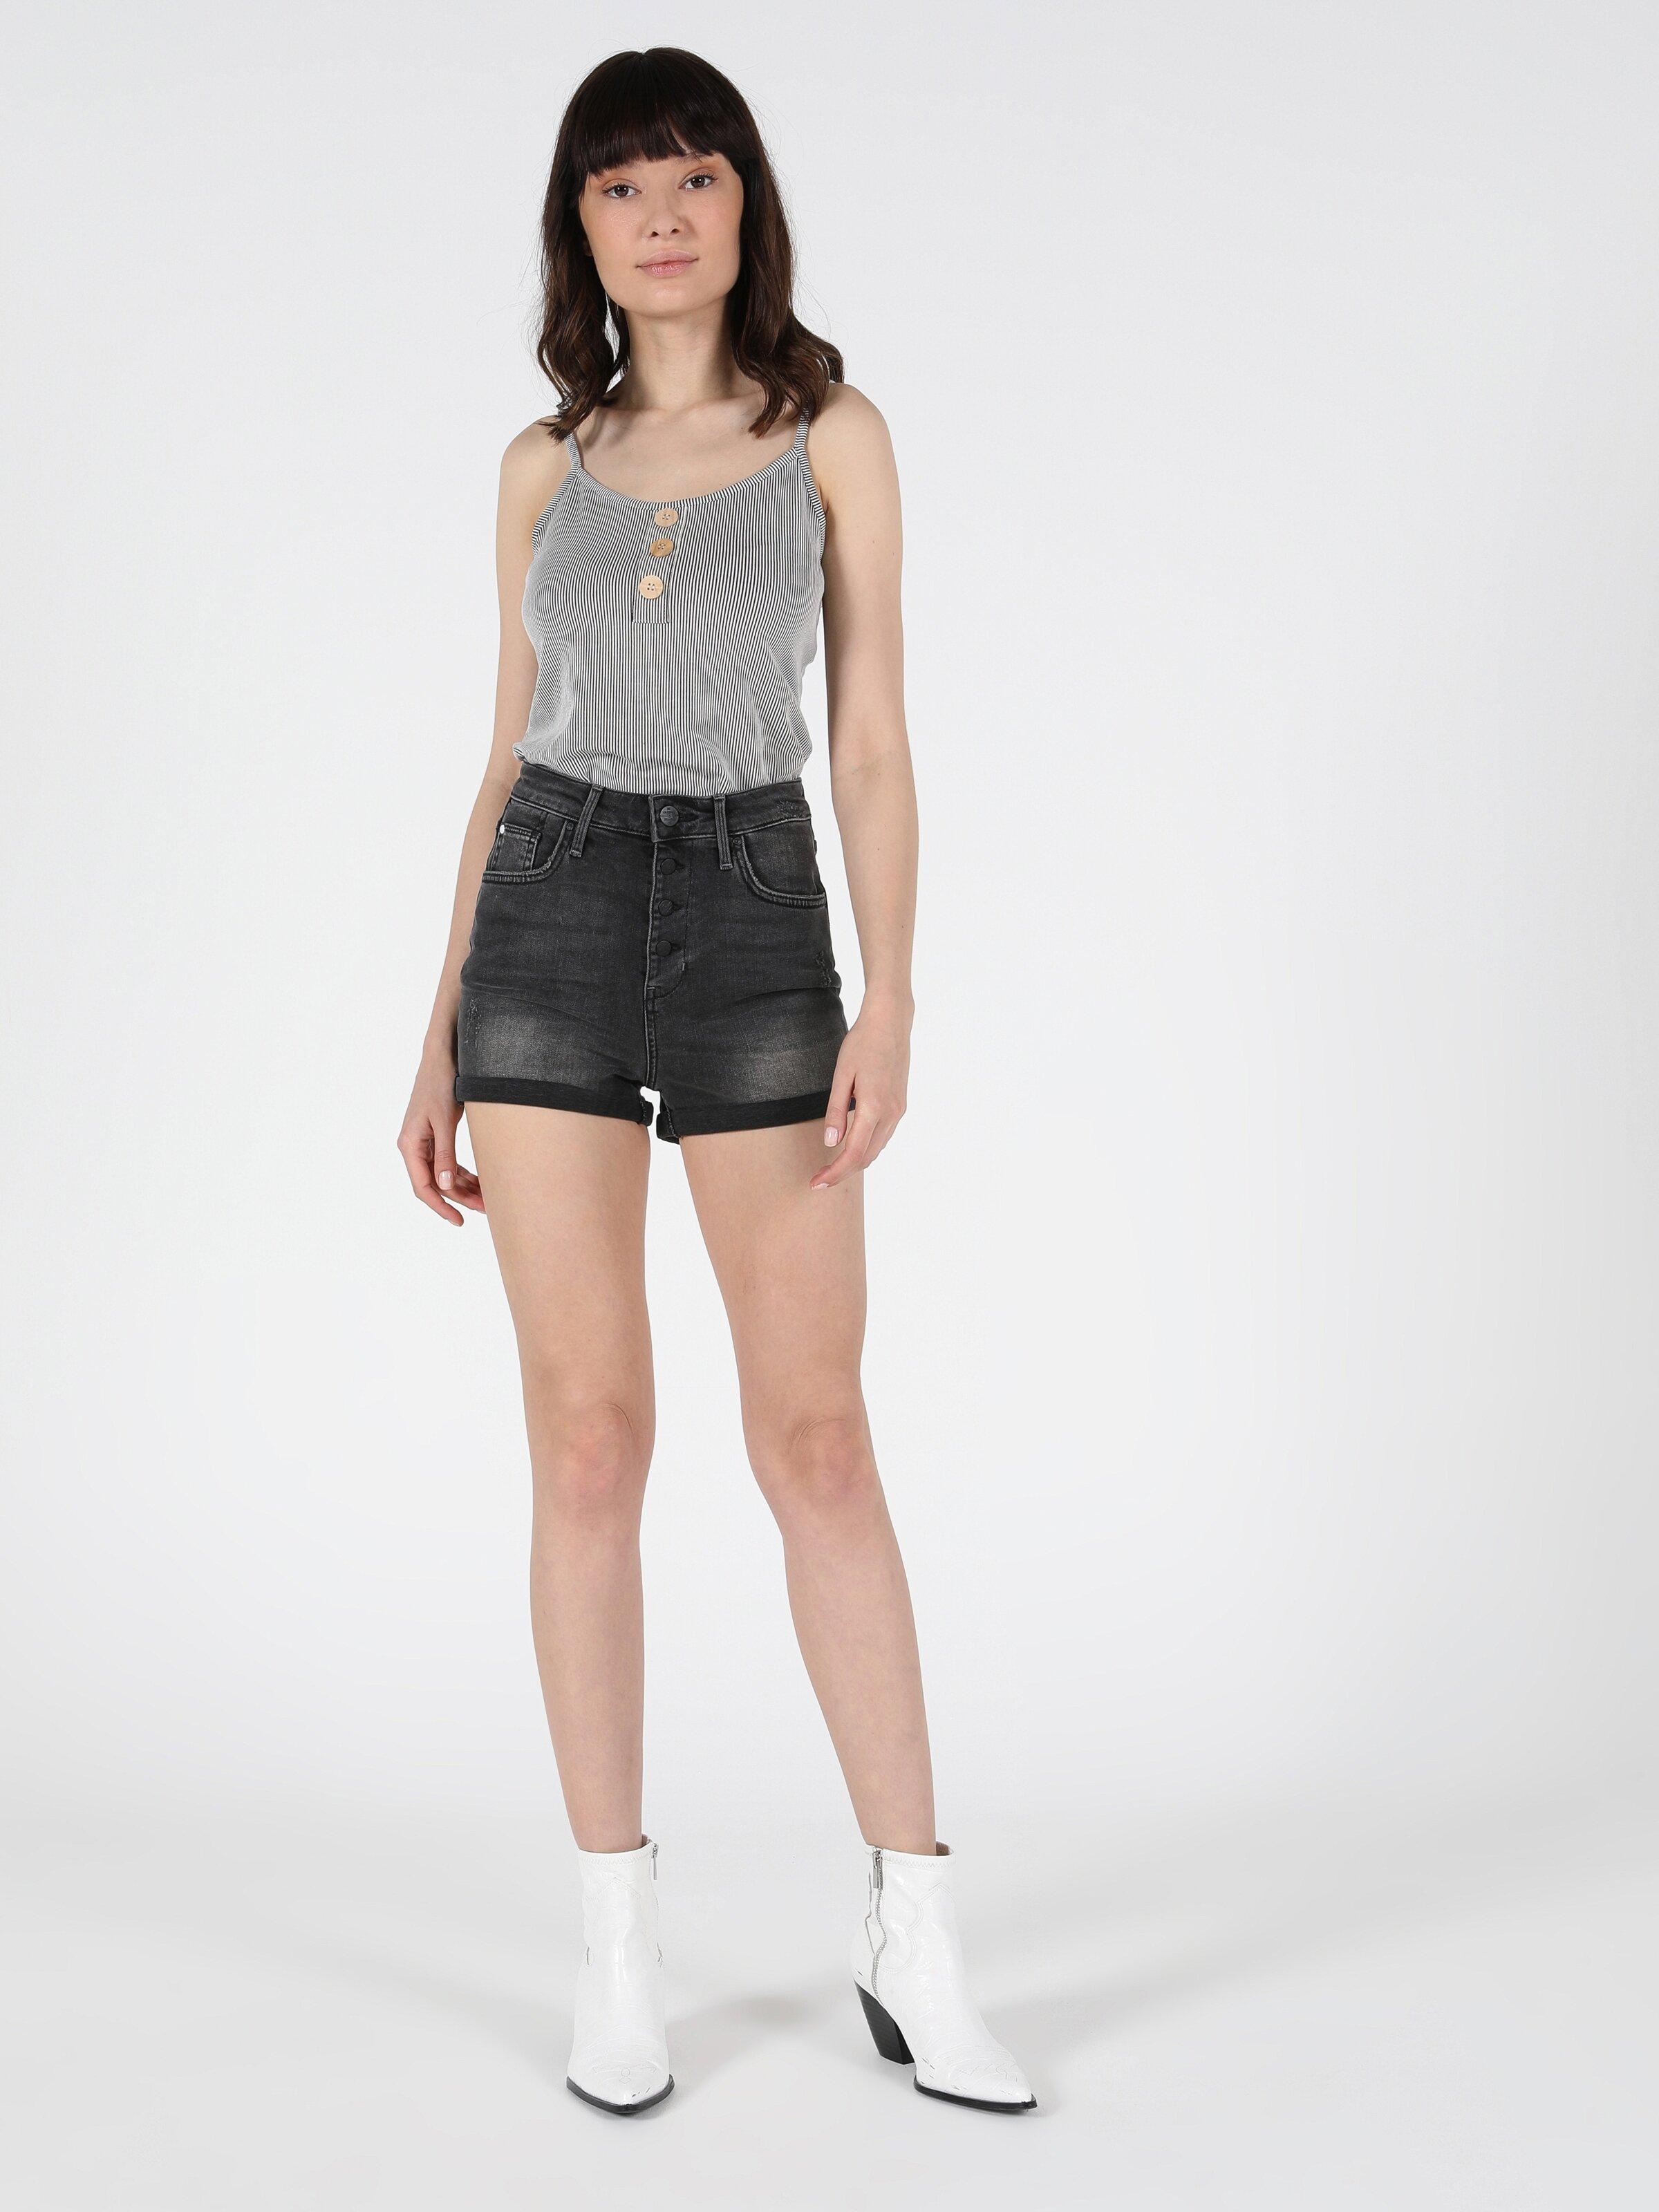 Yüksek Bel Kisa Super Slim Fit Jean Kadın Jean Şort